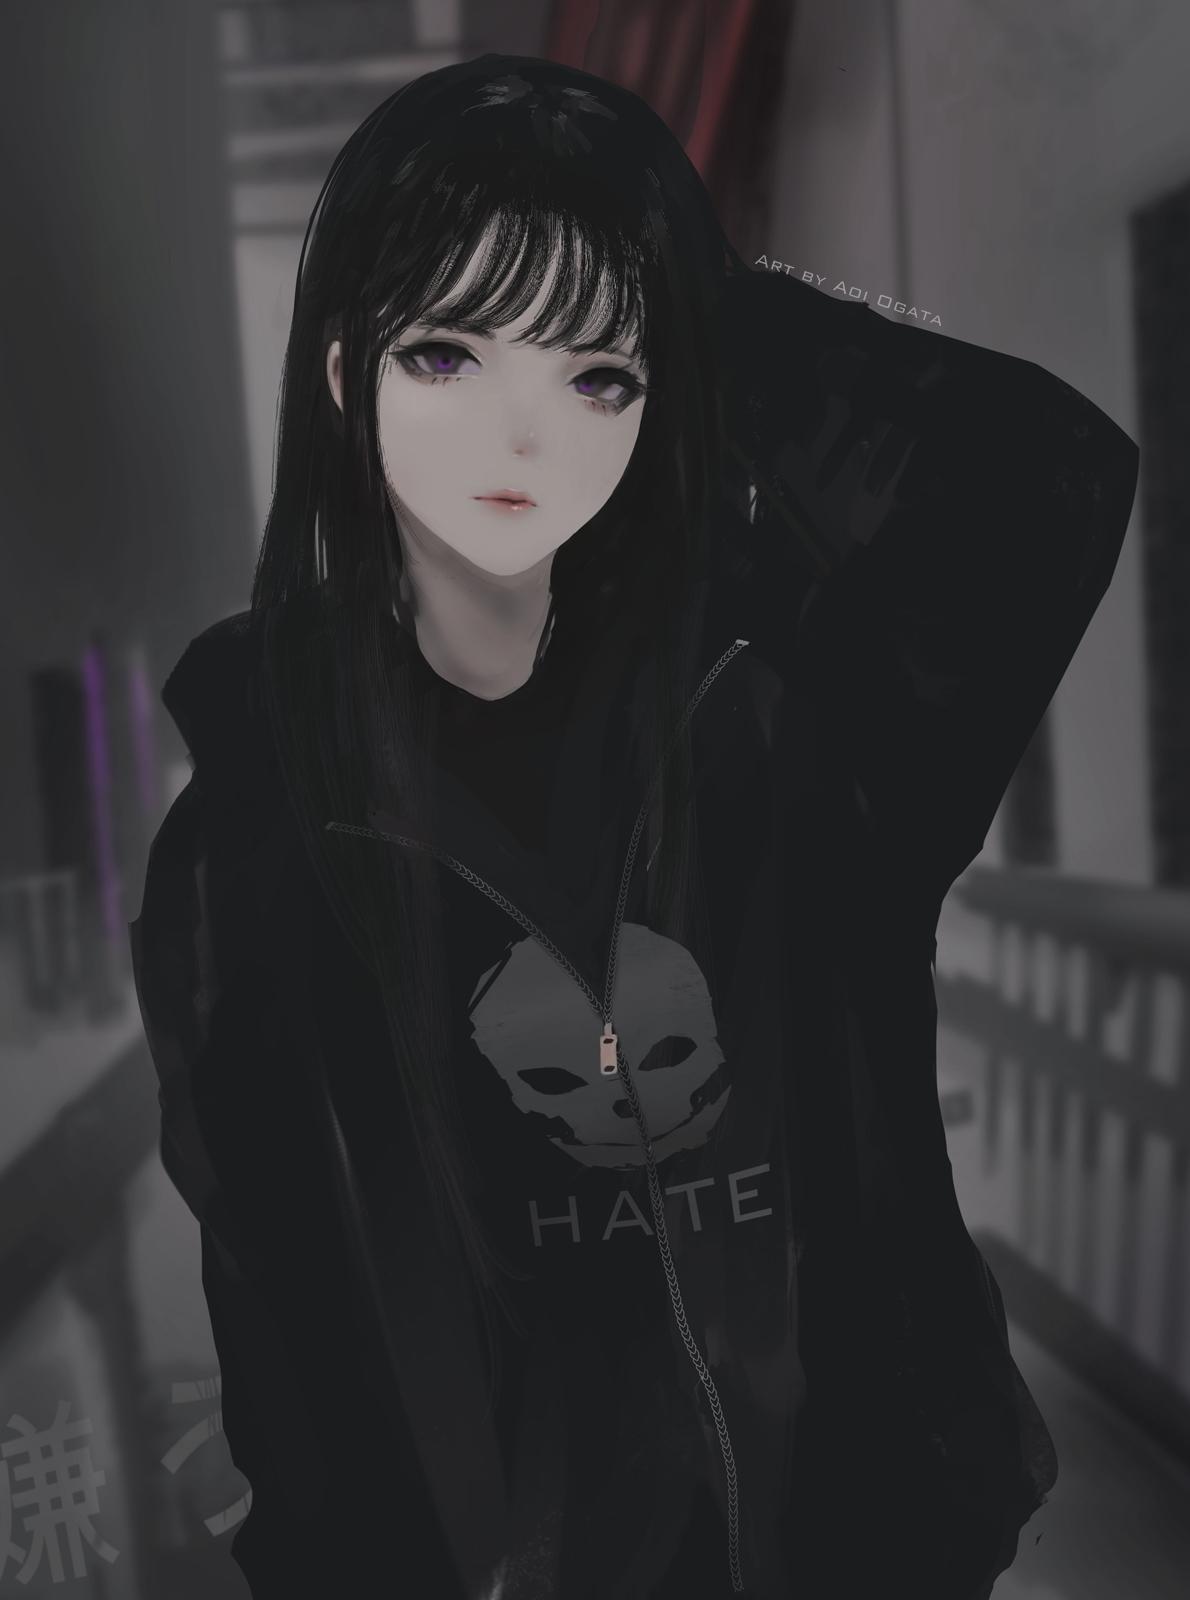 Hate Chan - Aoi Ogata - Zerochan Anime Image Board